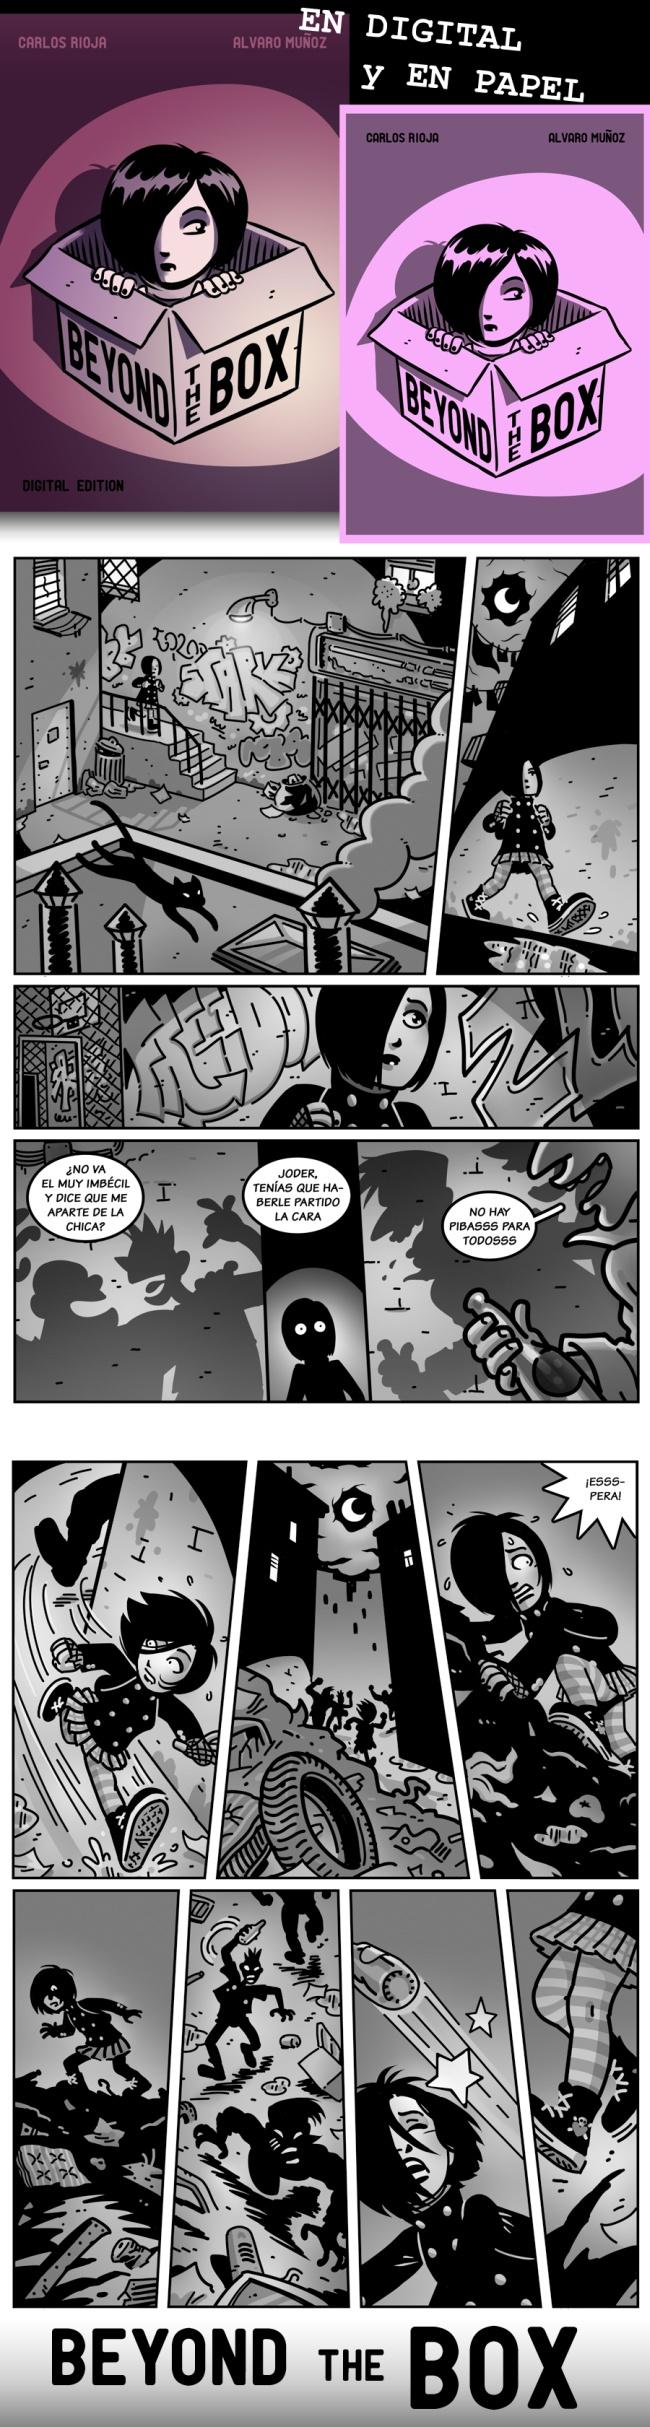 curso-comic-Madrid-Academiac10-Alvaro-Muñoz